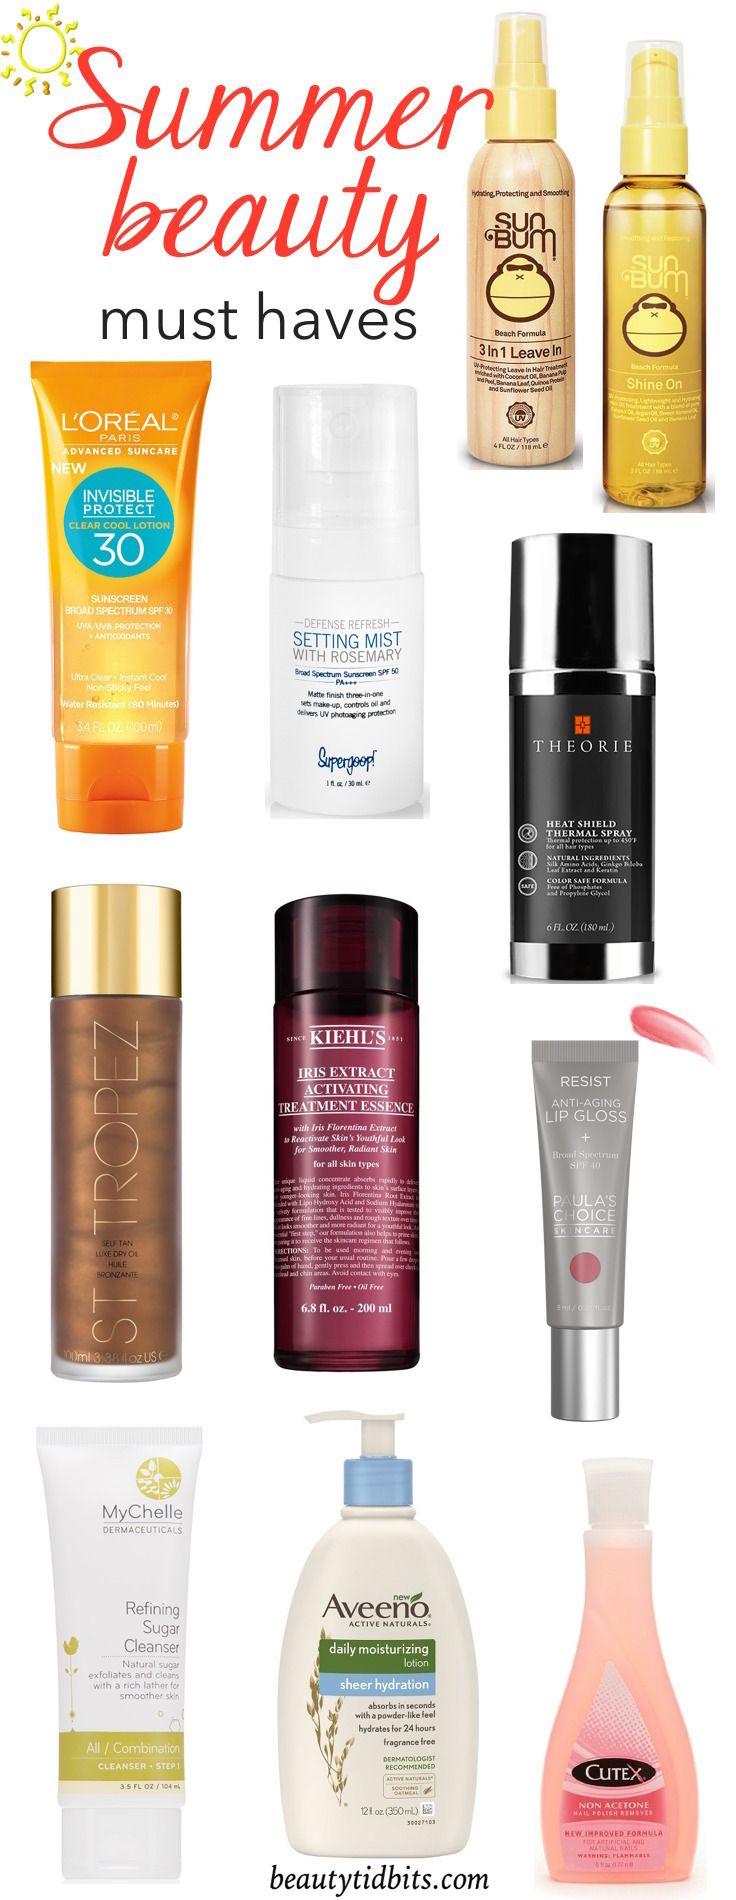 10 Summer Beauty Essentials To Beat The Heat #beautyessentials